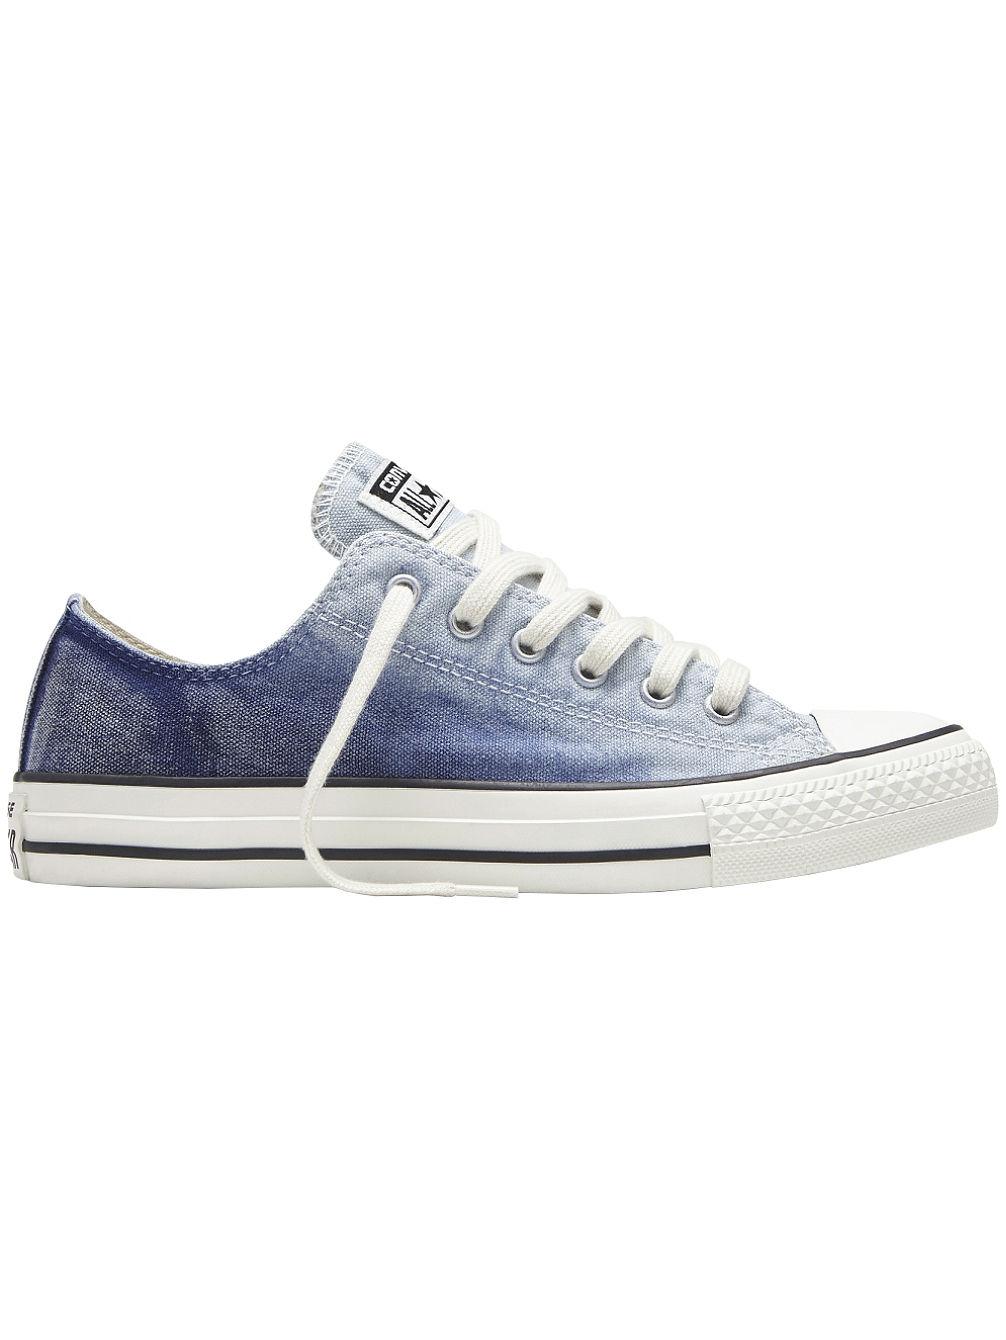 ec54f6433f5884 Converse Chuck Taylor All Star Sunset Wash Sneakers Frauen online kaufen  bei Blue Tomato